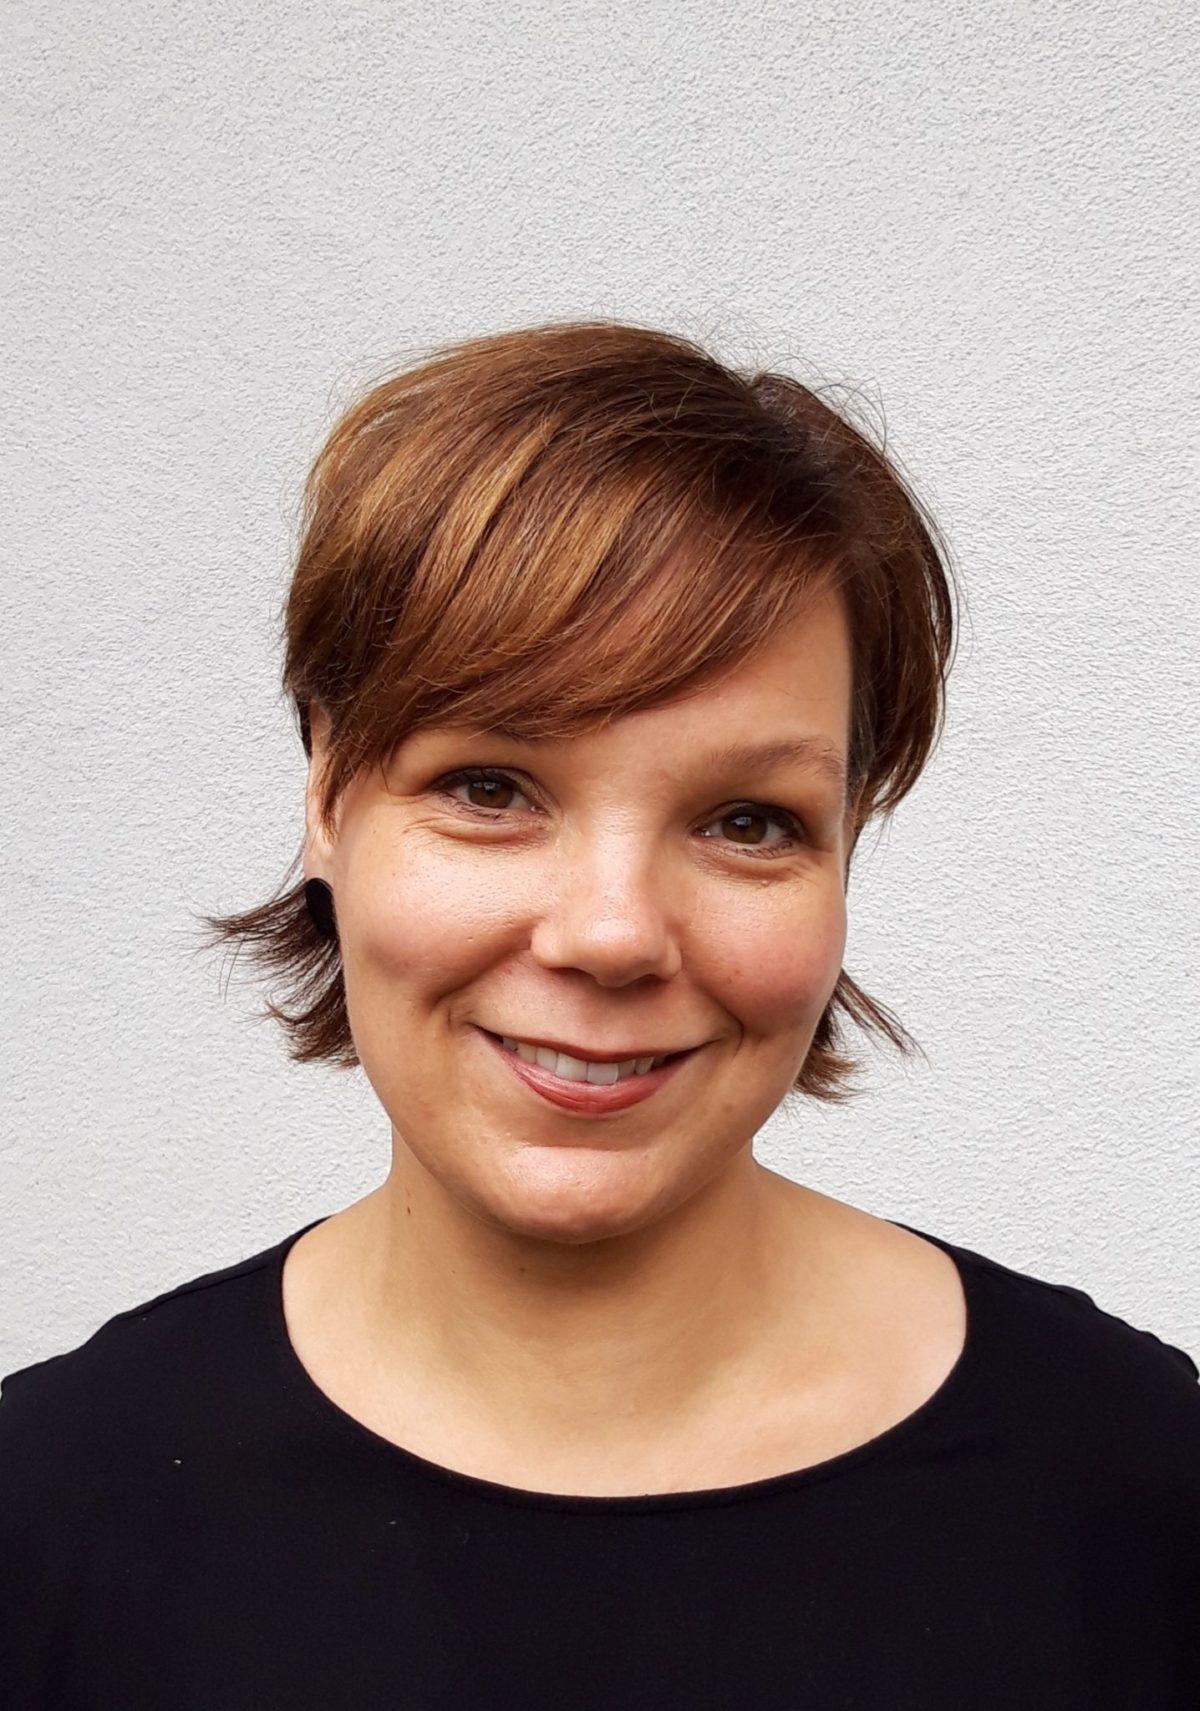 https://urbanes-lernen.obnf.de/wp-content/uploads/2020/07/Christina_Beilharz-scaled-e1593705440105.jpg